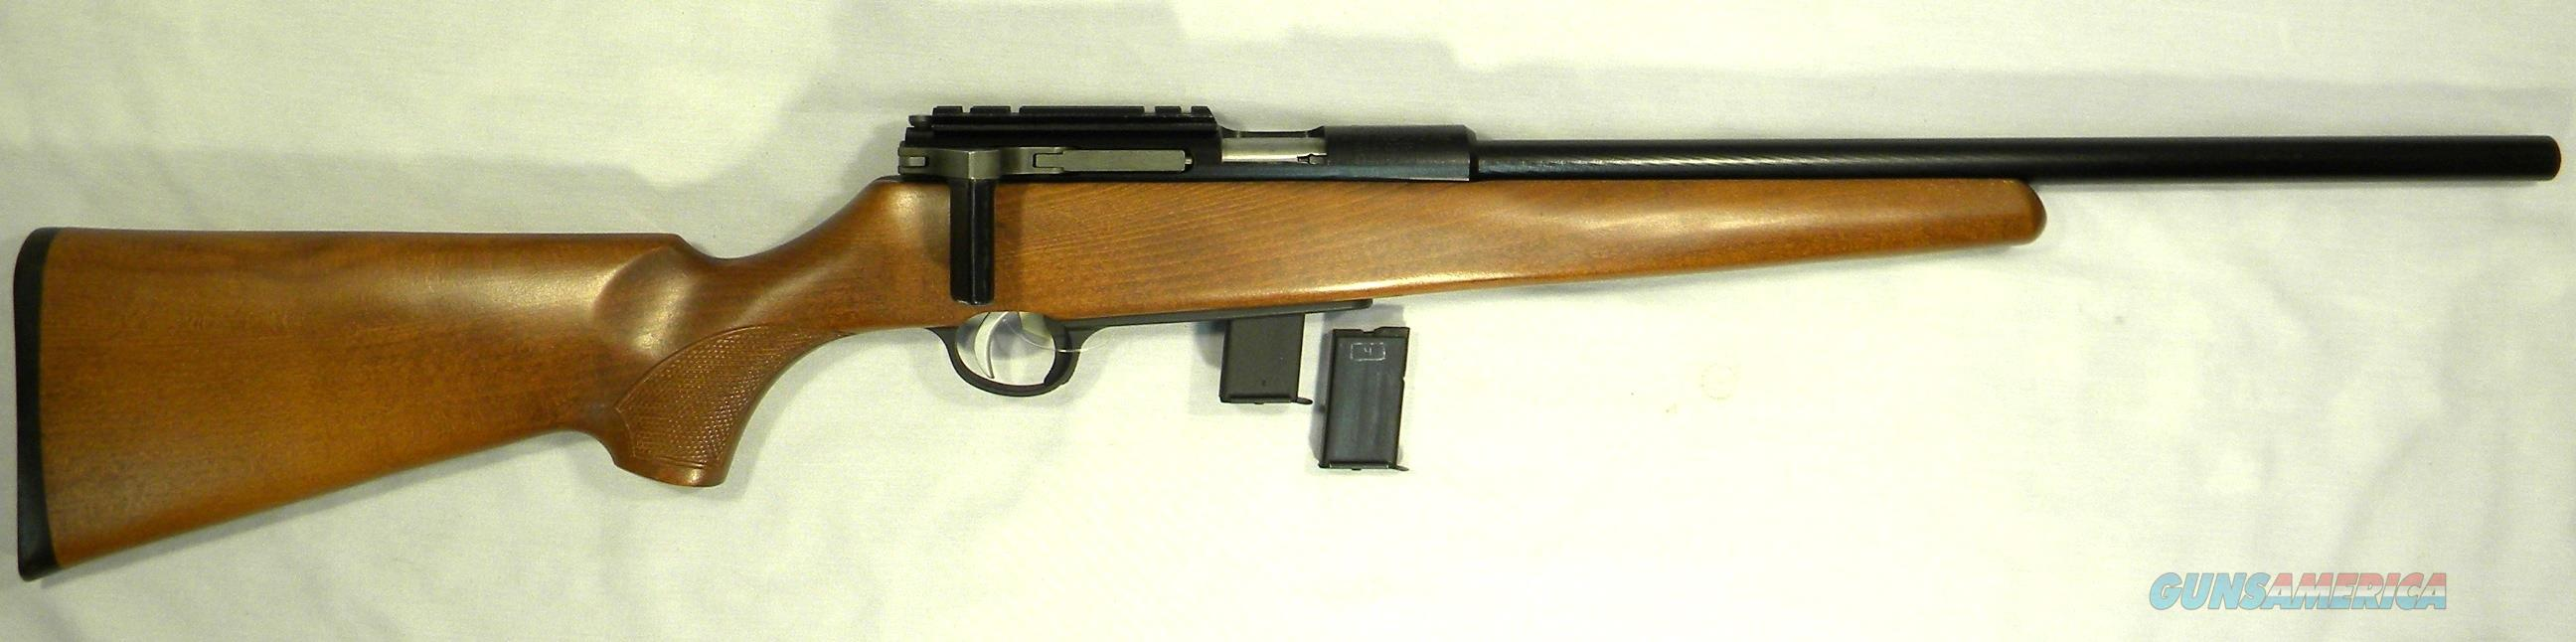 Izhmash Biathlon-7-2-KO, .22LR, Olympic Biathlon-Style Competition Rifle, As-New  Guns > Rifles > Izhmash Rifles